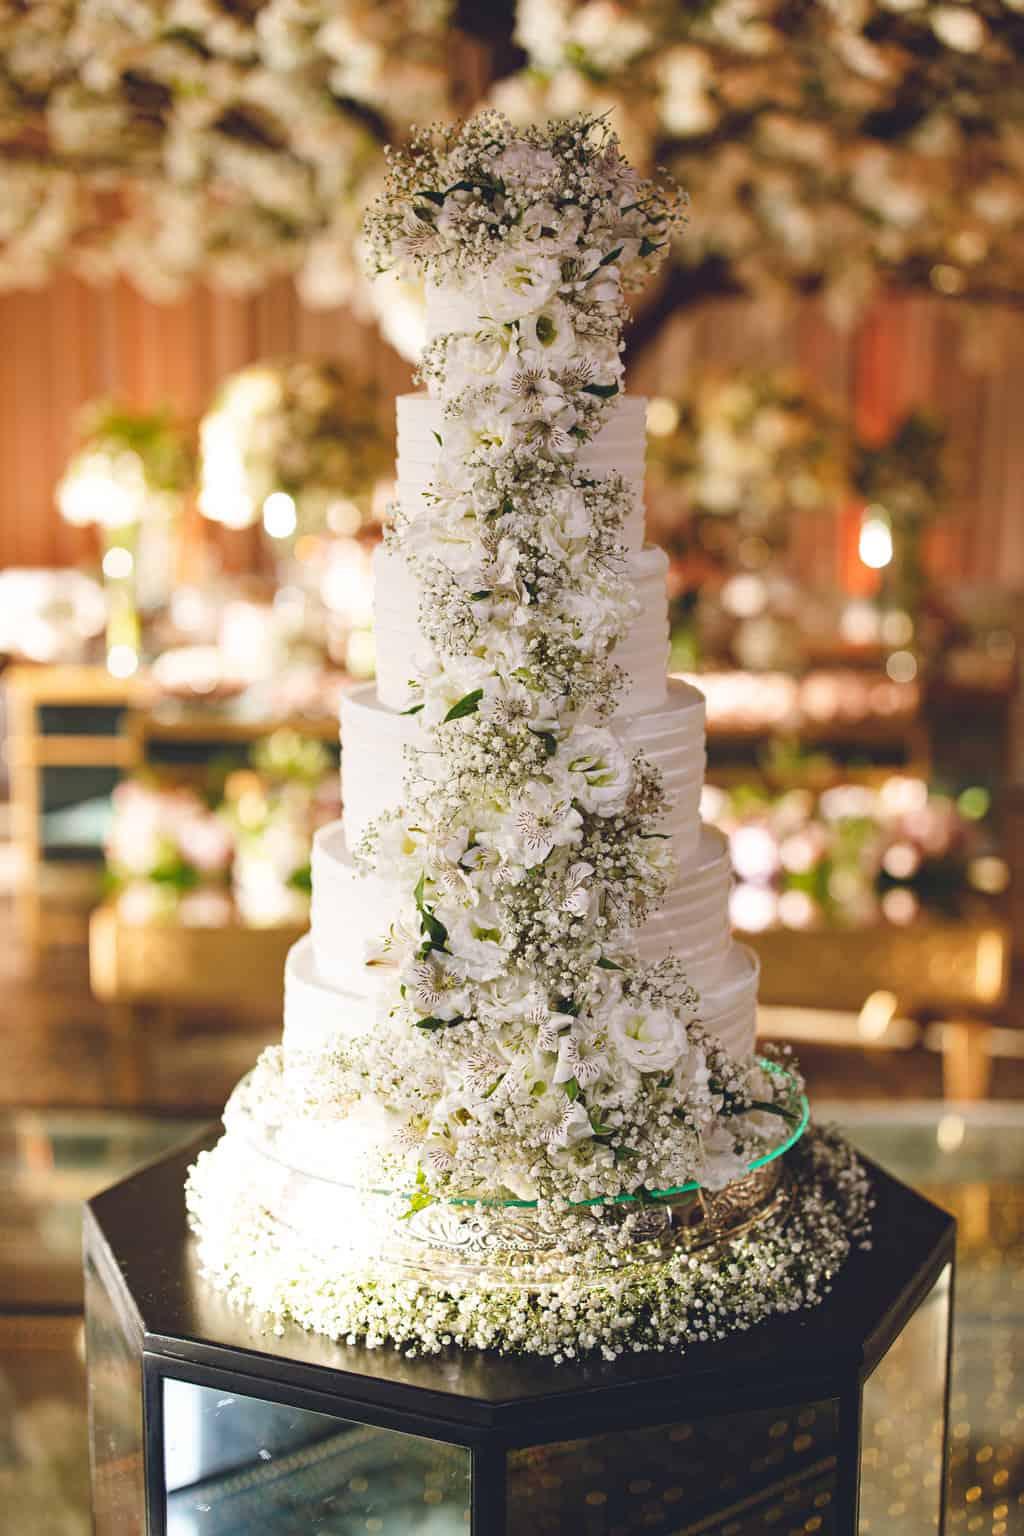 Casamento-de-Bianka-e-Nilo-Fotografia-Marcelo-Schmoeller-SC-Alameda-Casa-Rosa-03082019_bianka-e-nilo_0938